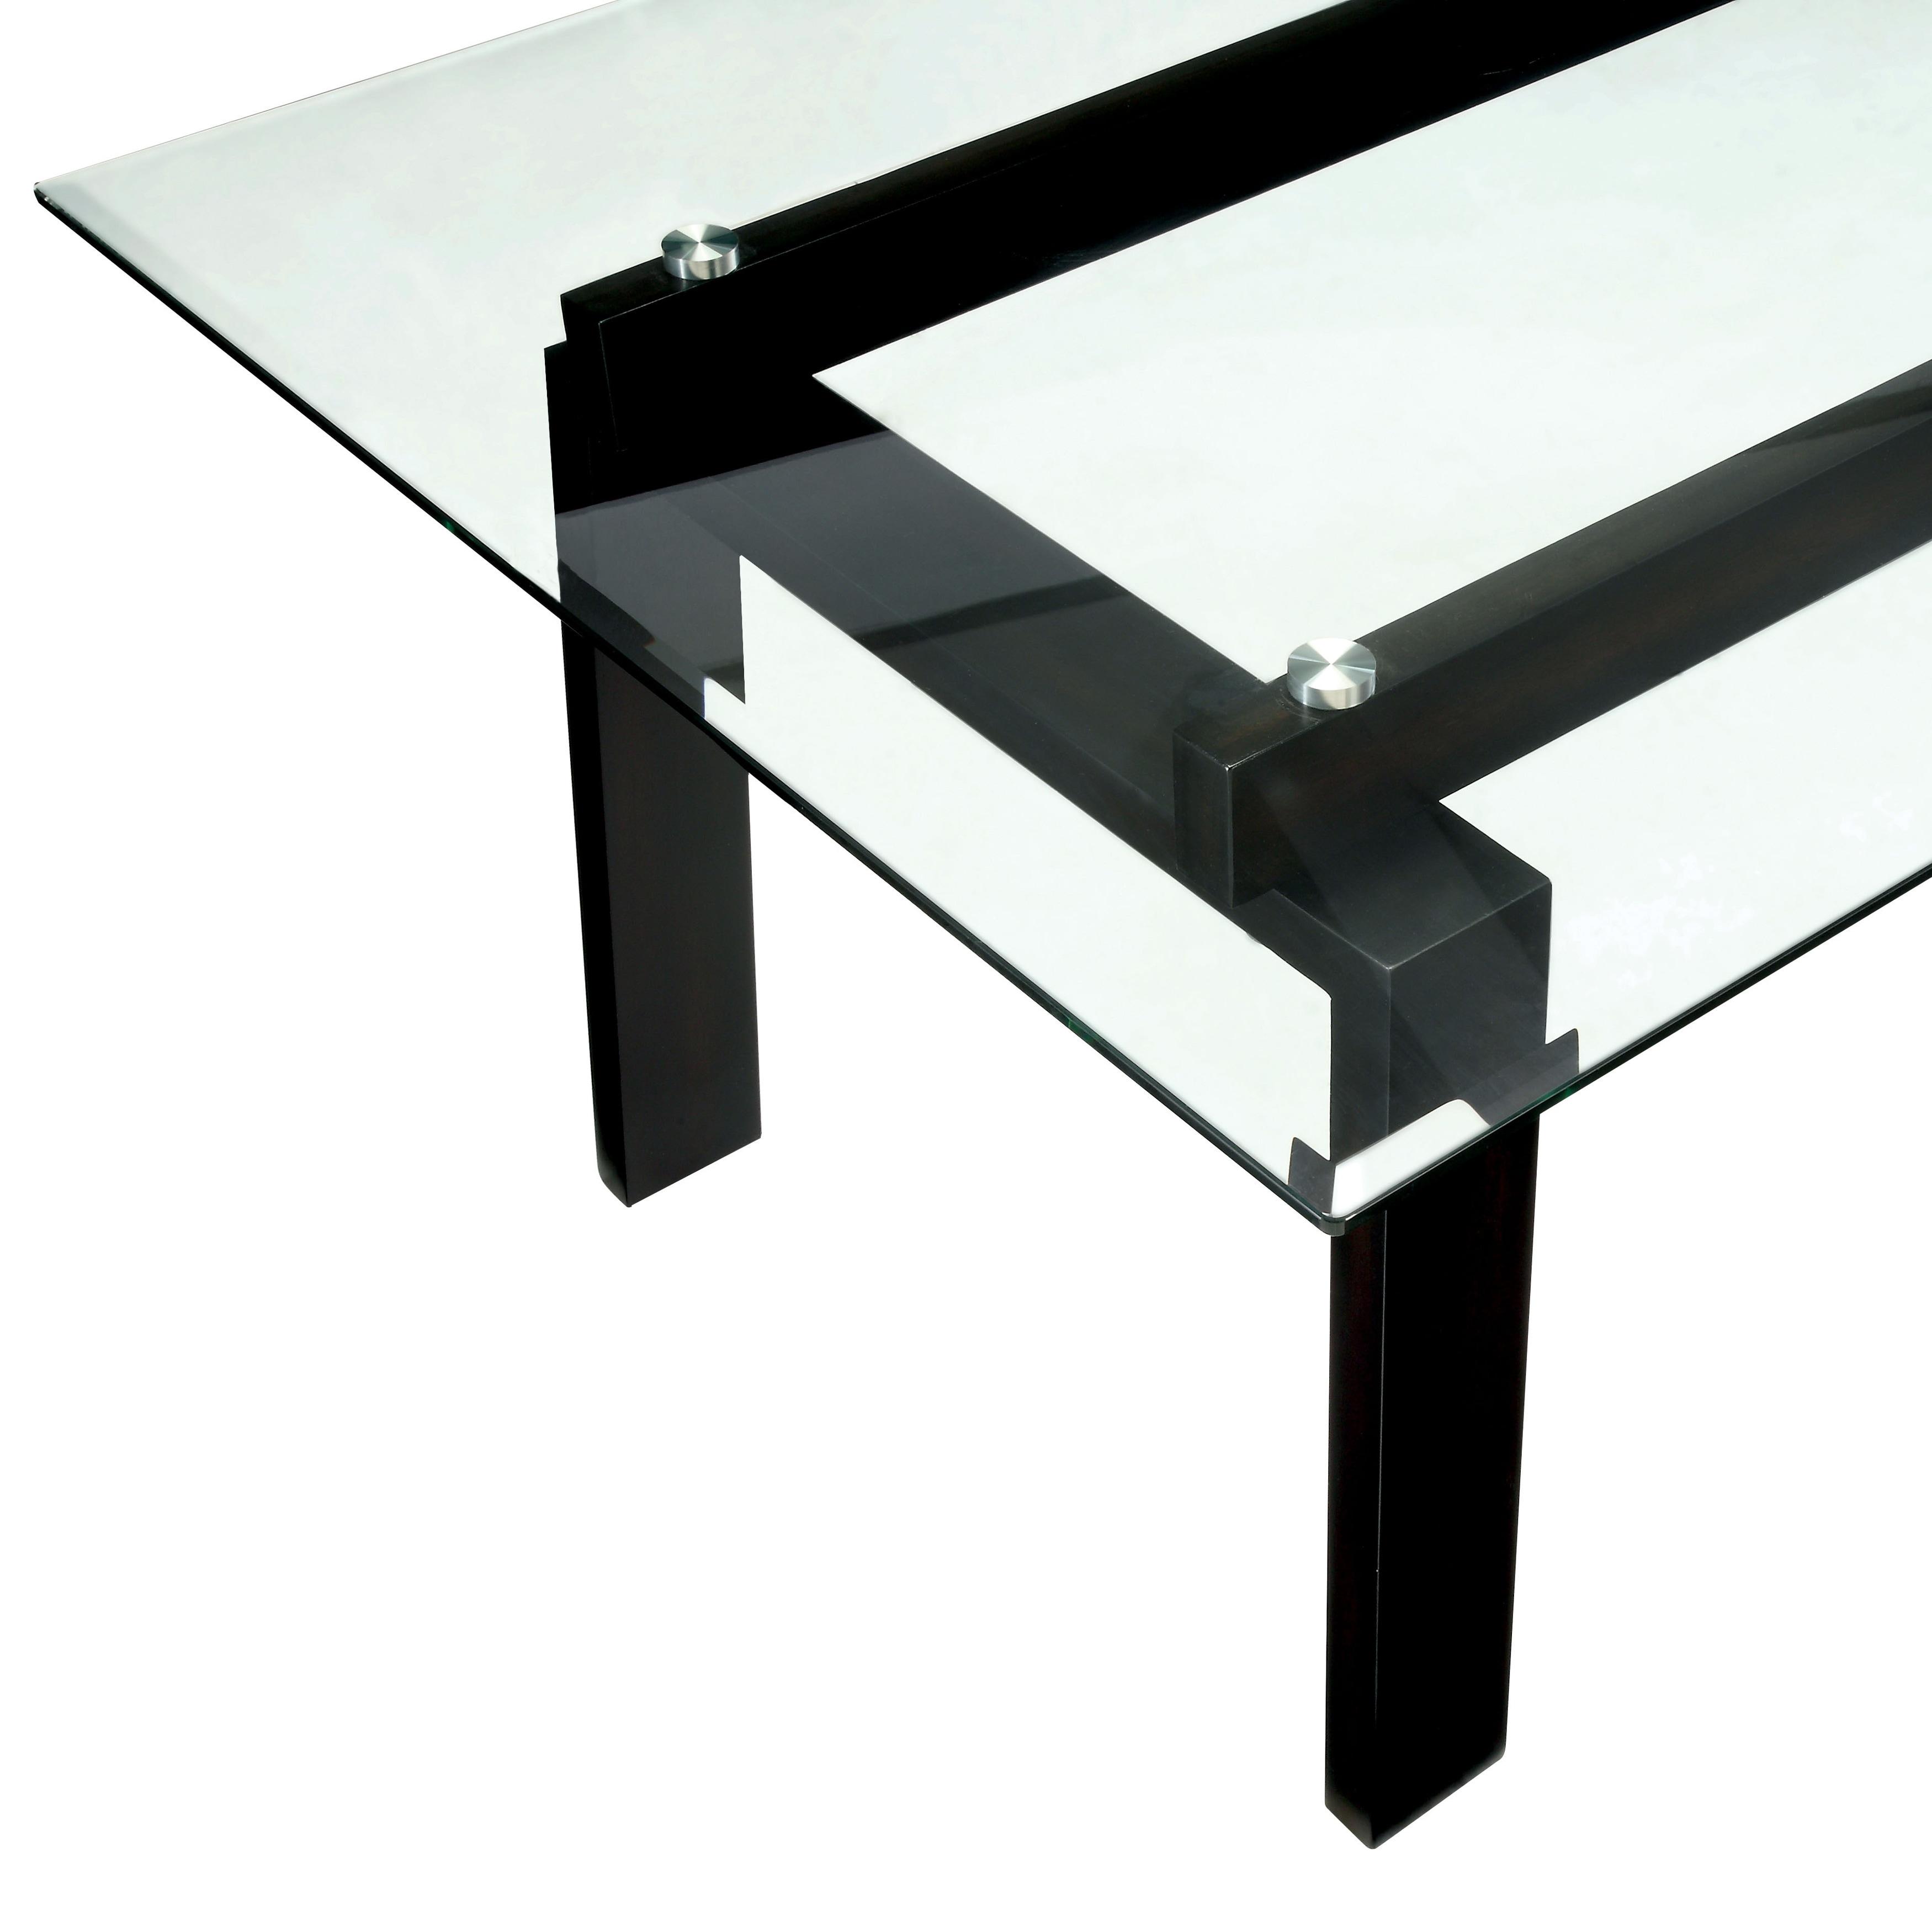 Furniture of America Serafin Contemporary Glass Top